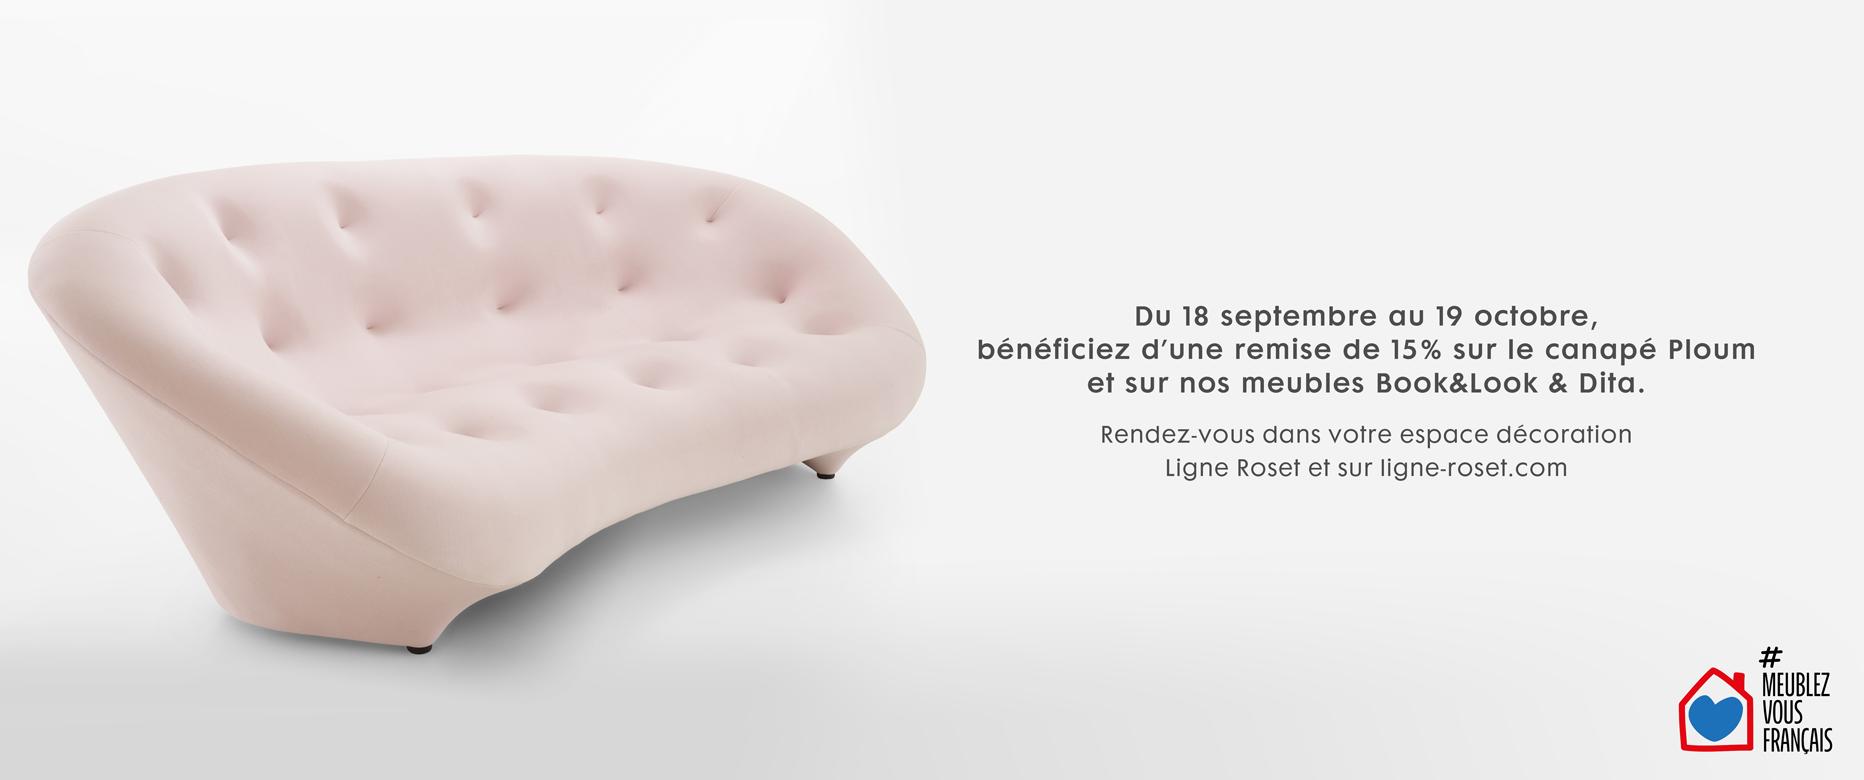 PROMO_PLOUM_DITA_FRANCE Ligne Roset